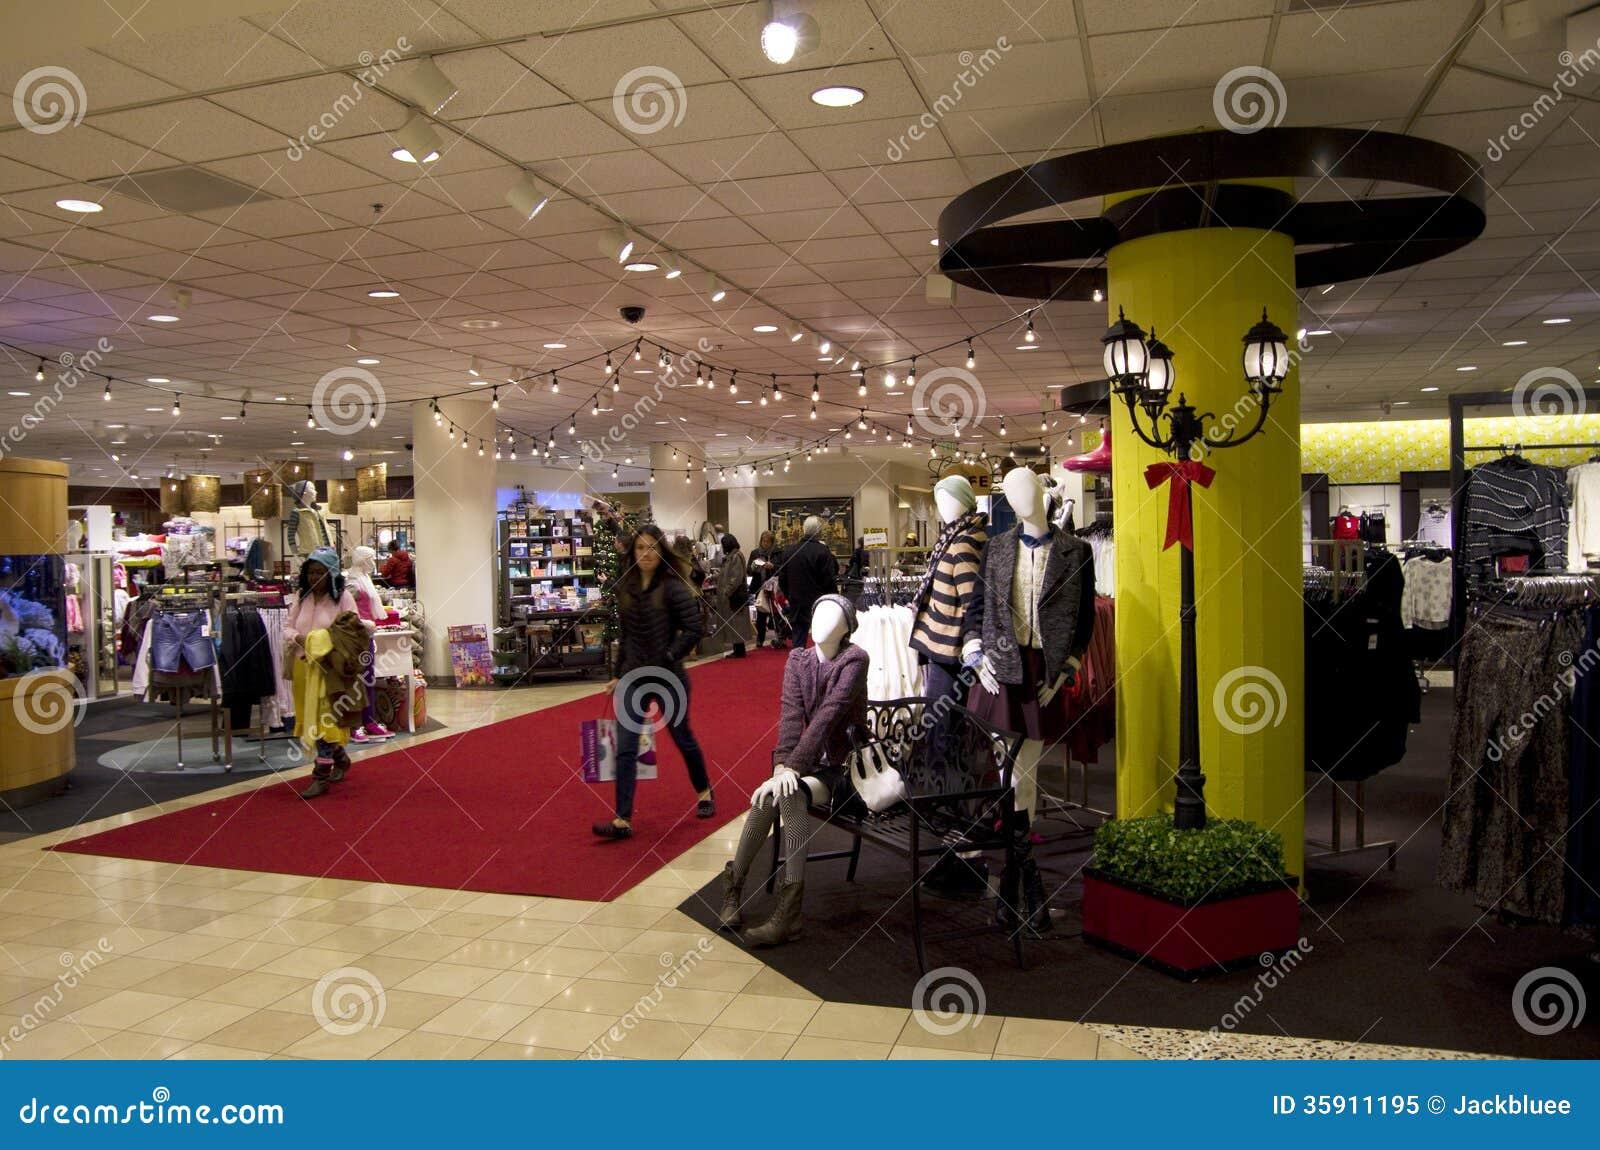 Fancy department store lighting interiors shop Editorial Image